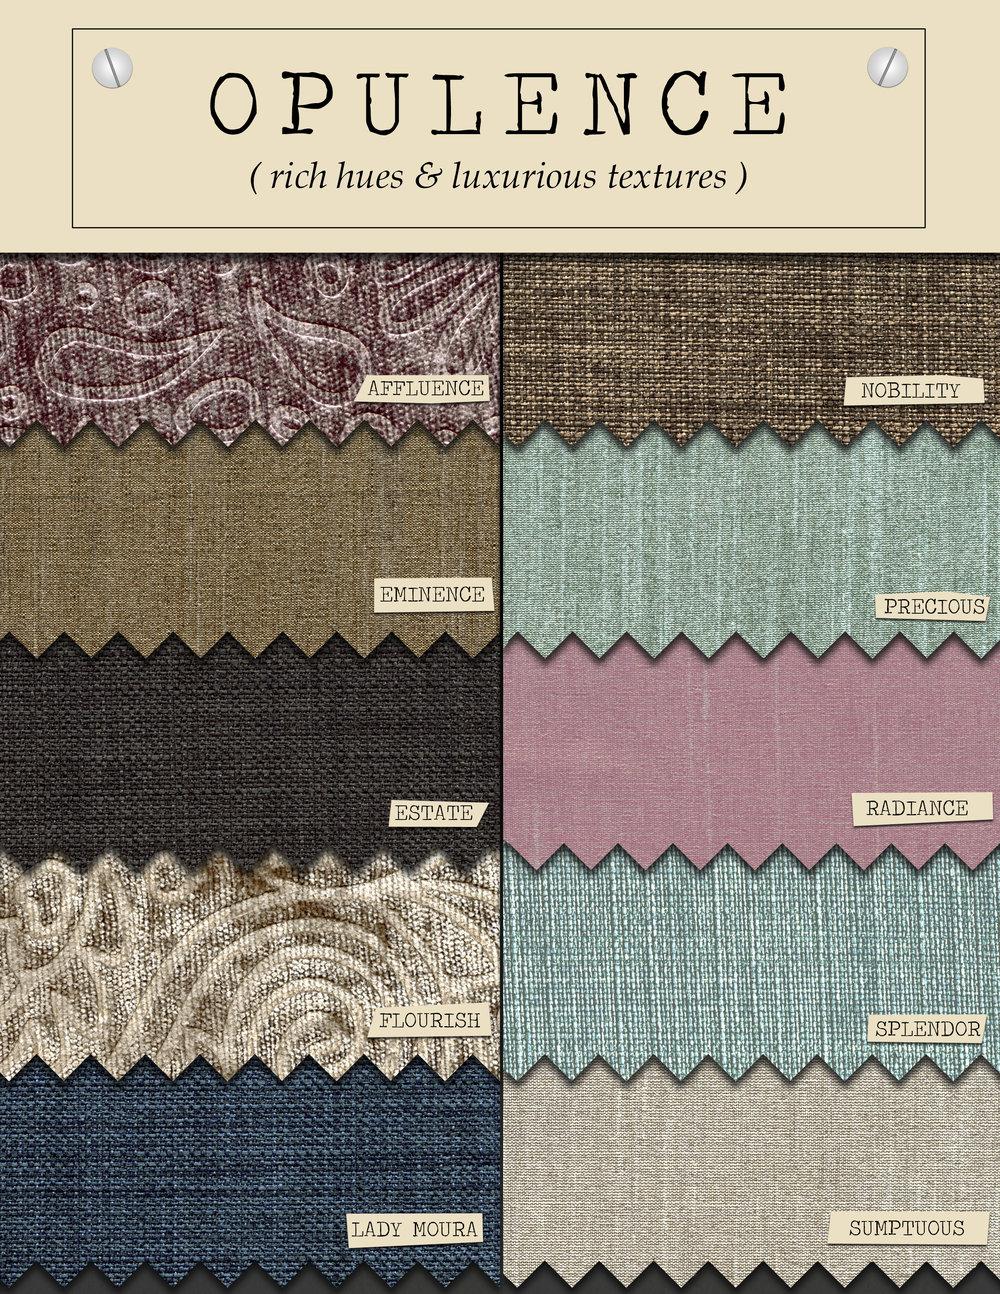 Textured & Silky Fabrics